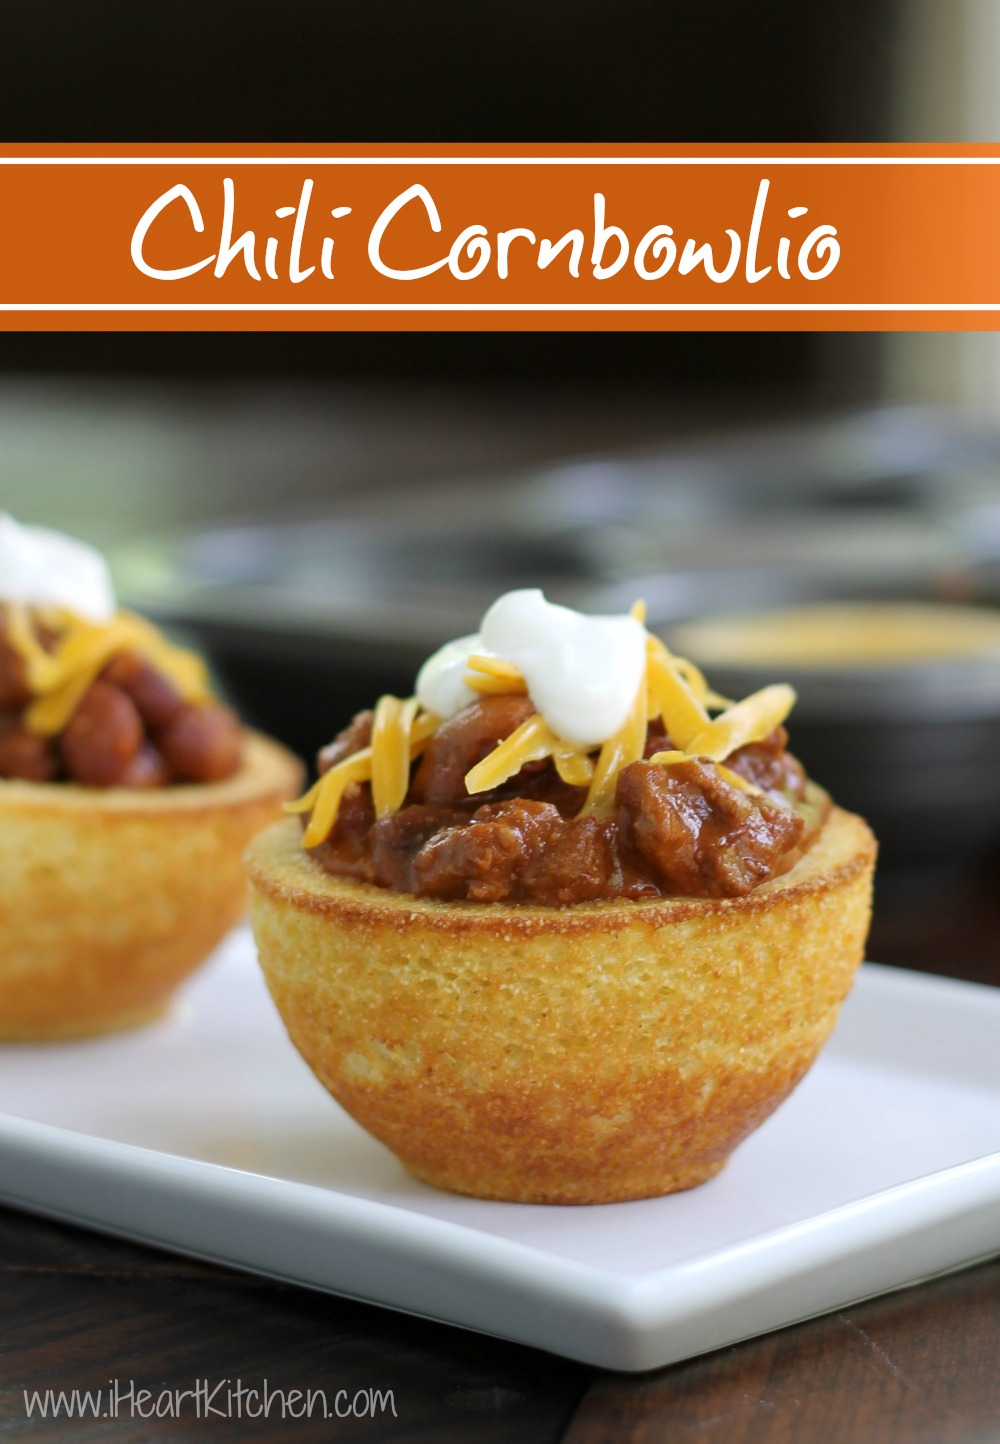 Chili Cornbowlio